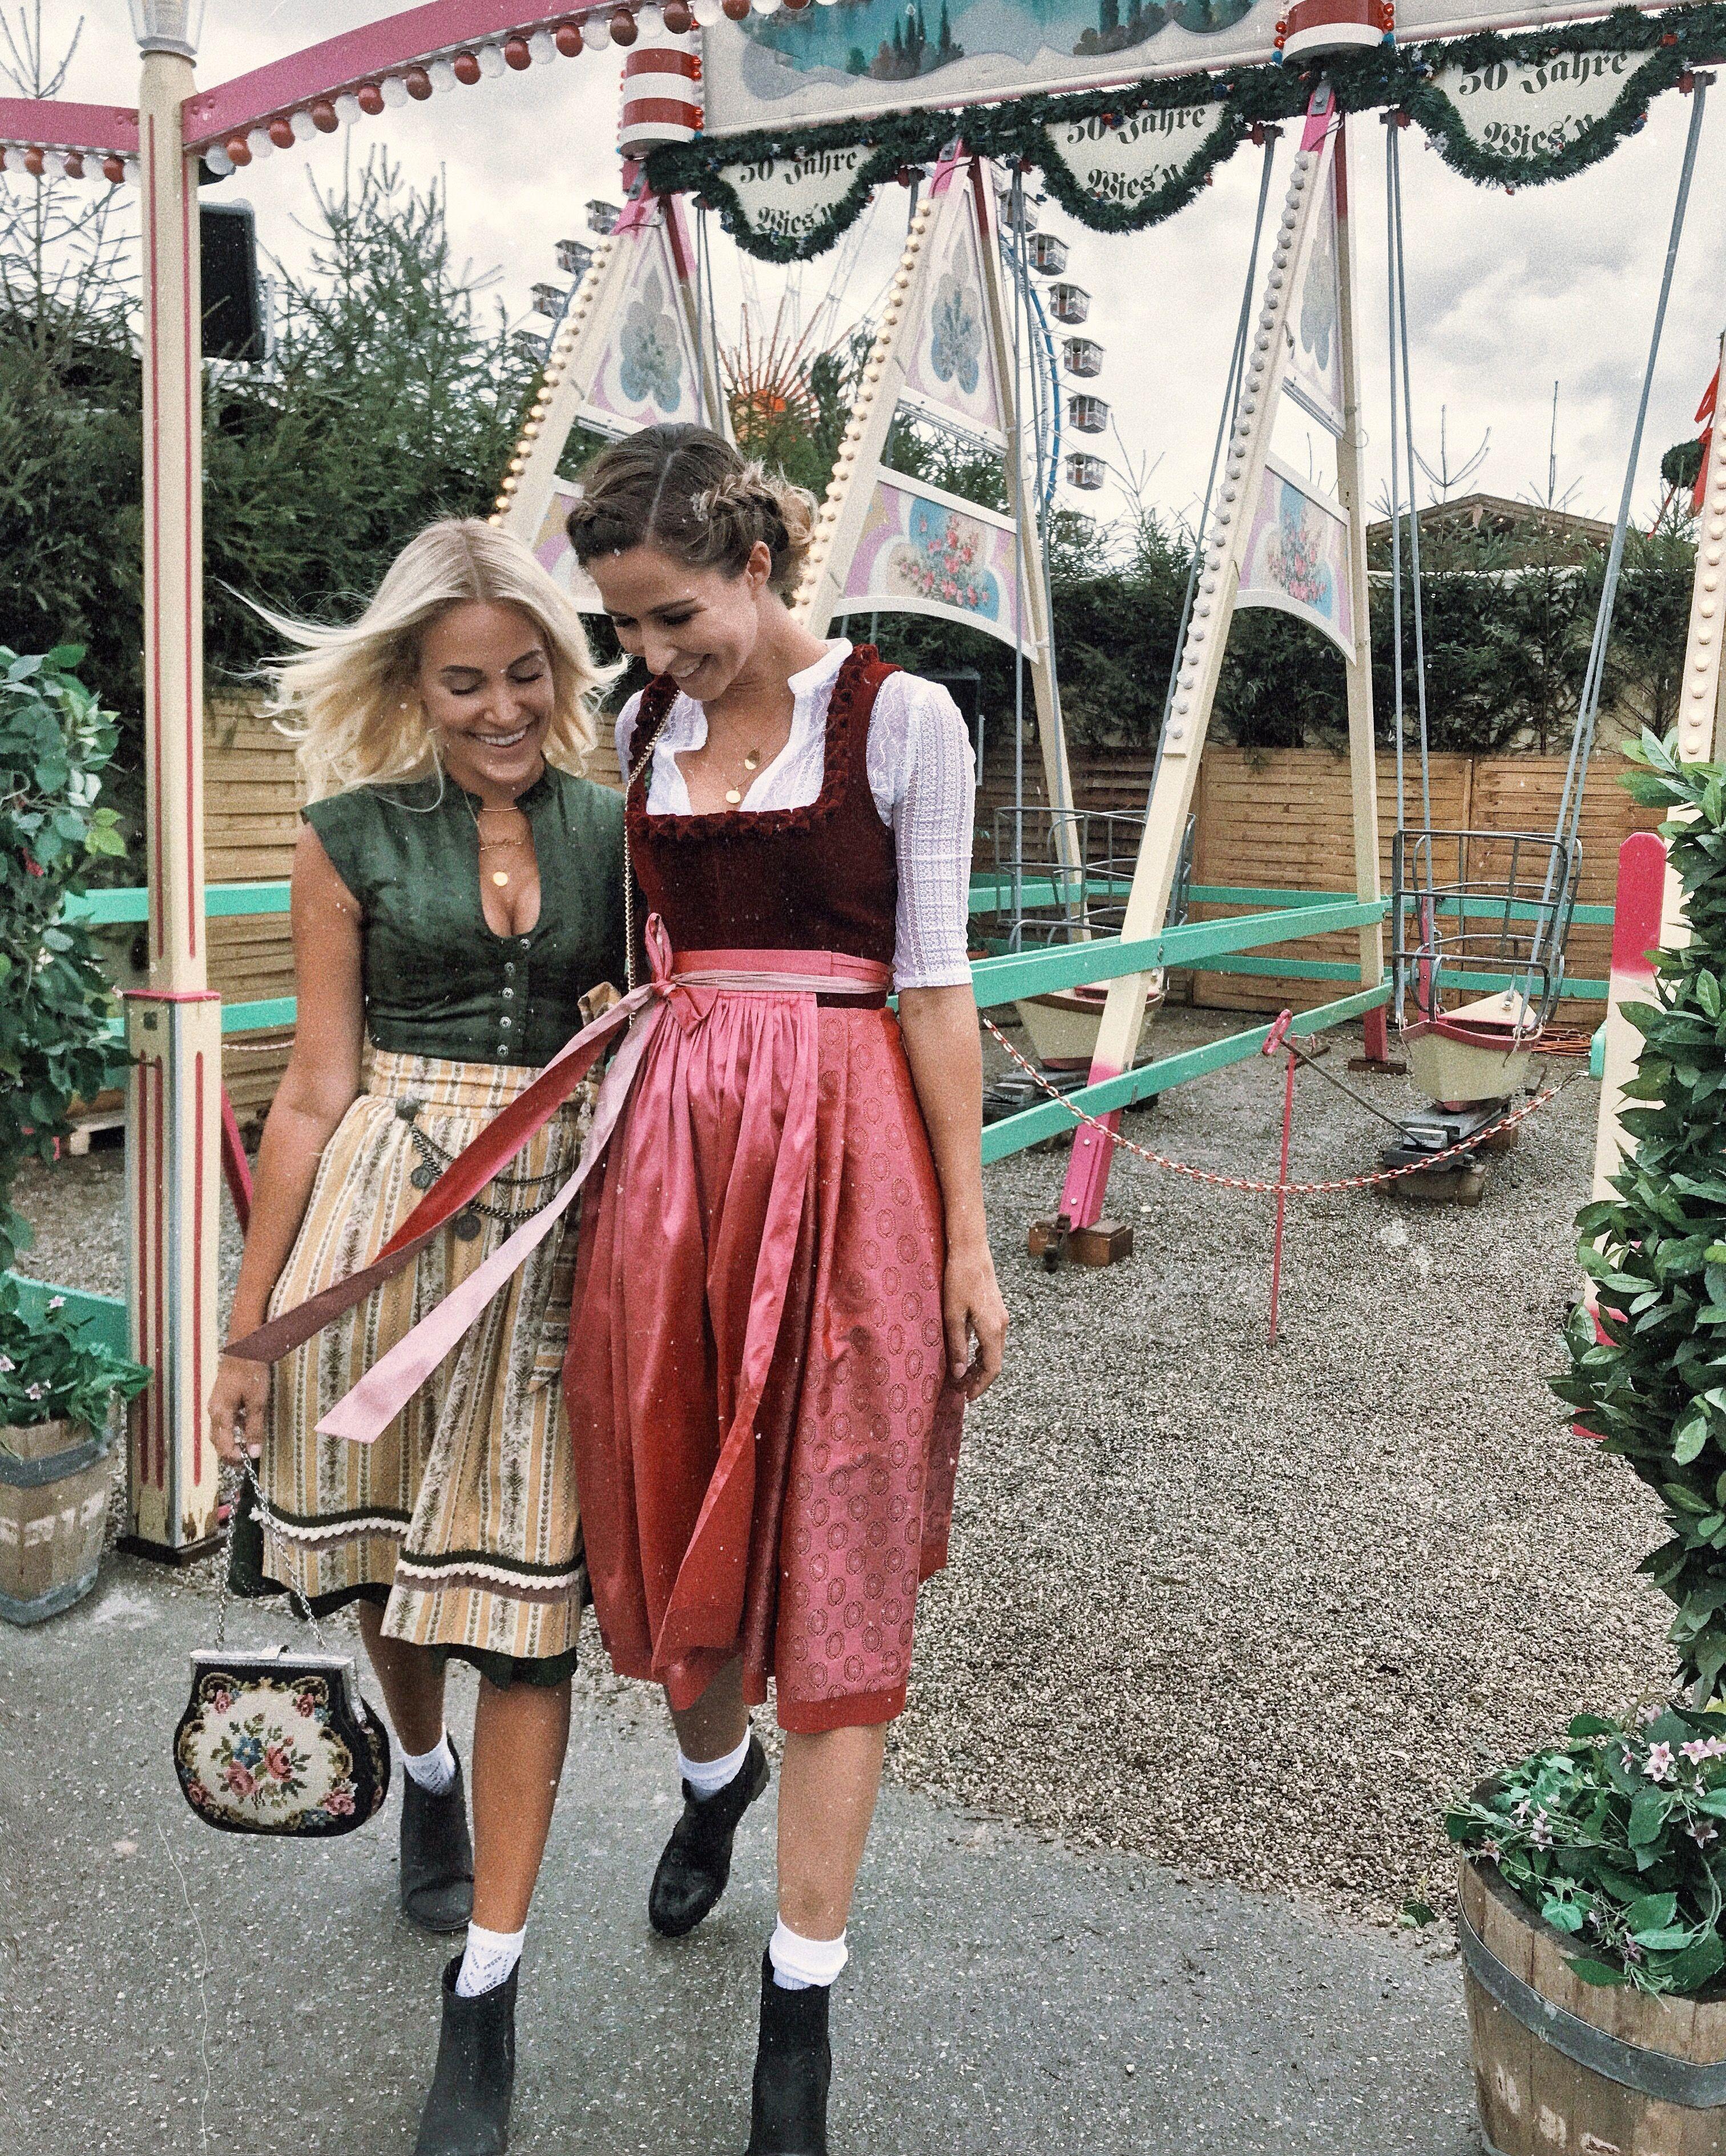 Dirndl, Tracht, Oktoberfest, Fashion, Wiesn, Friends, Girls